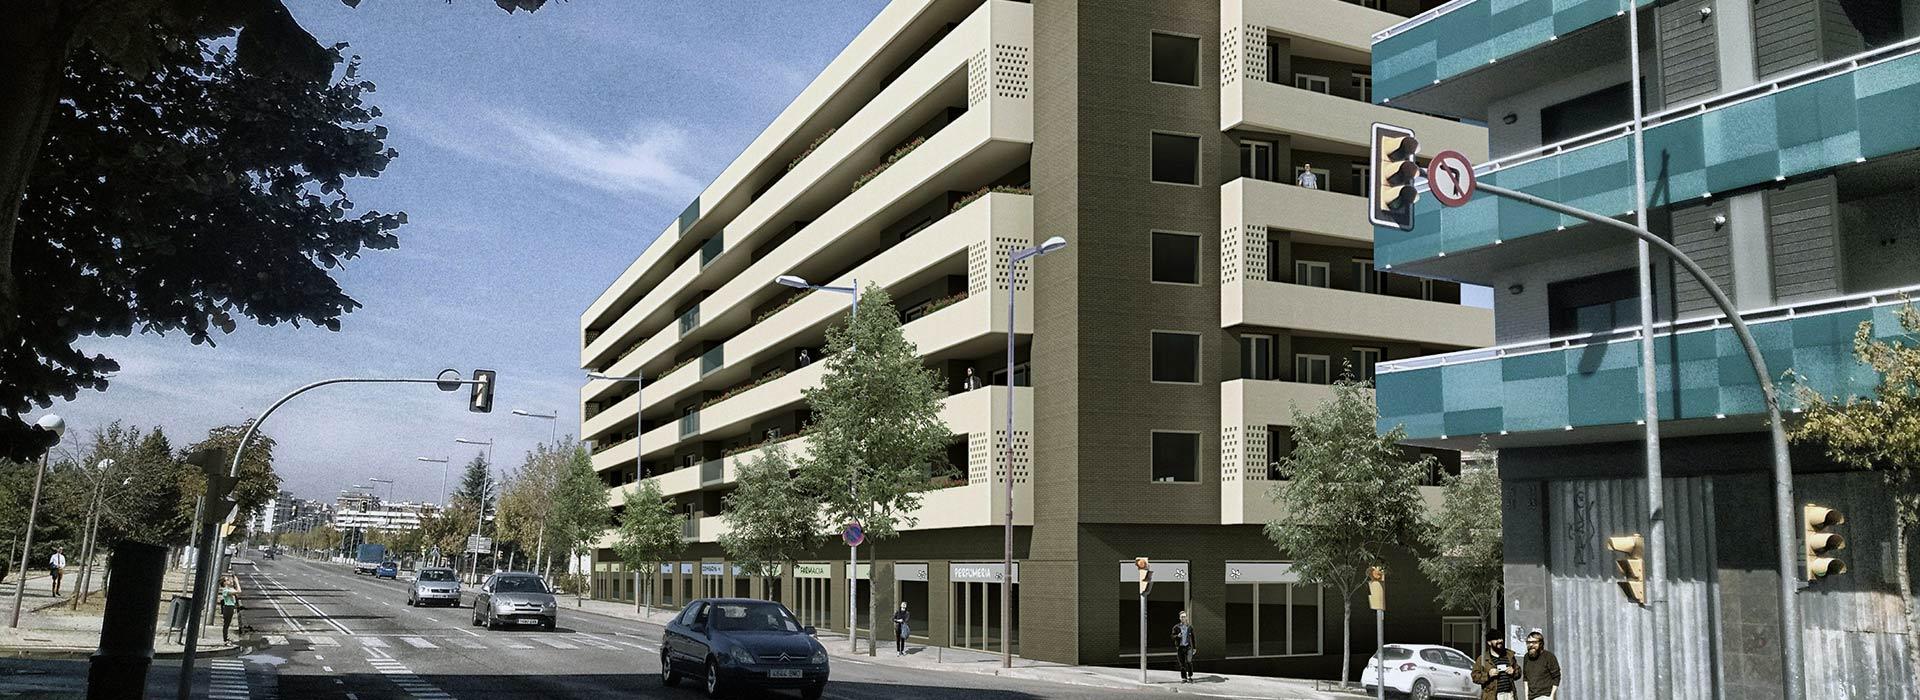 Facha-edificio-status-Lleida